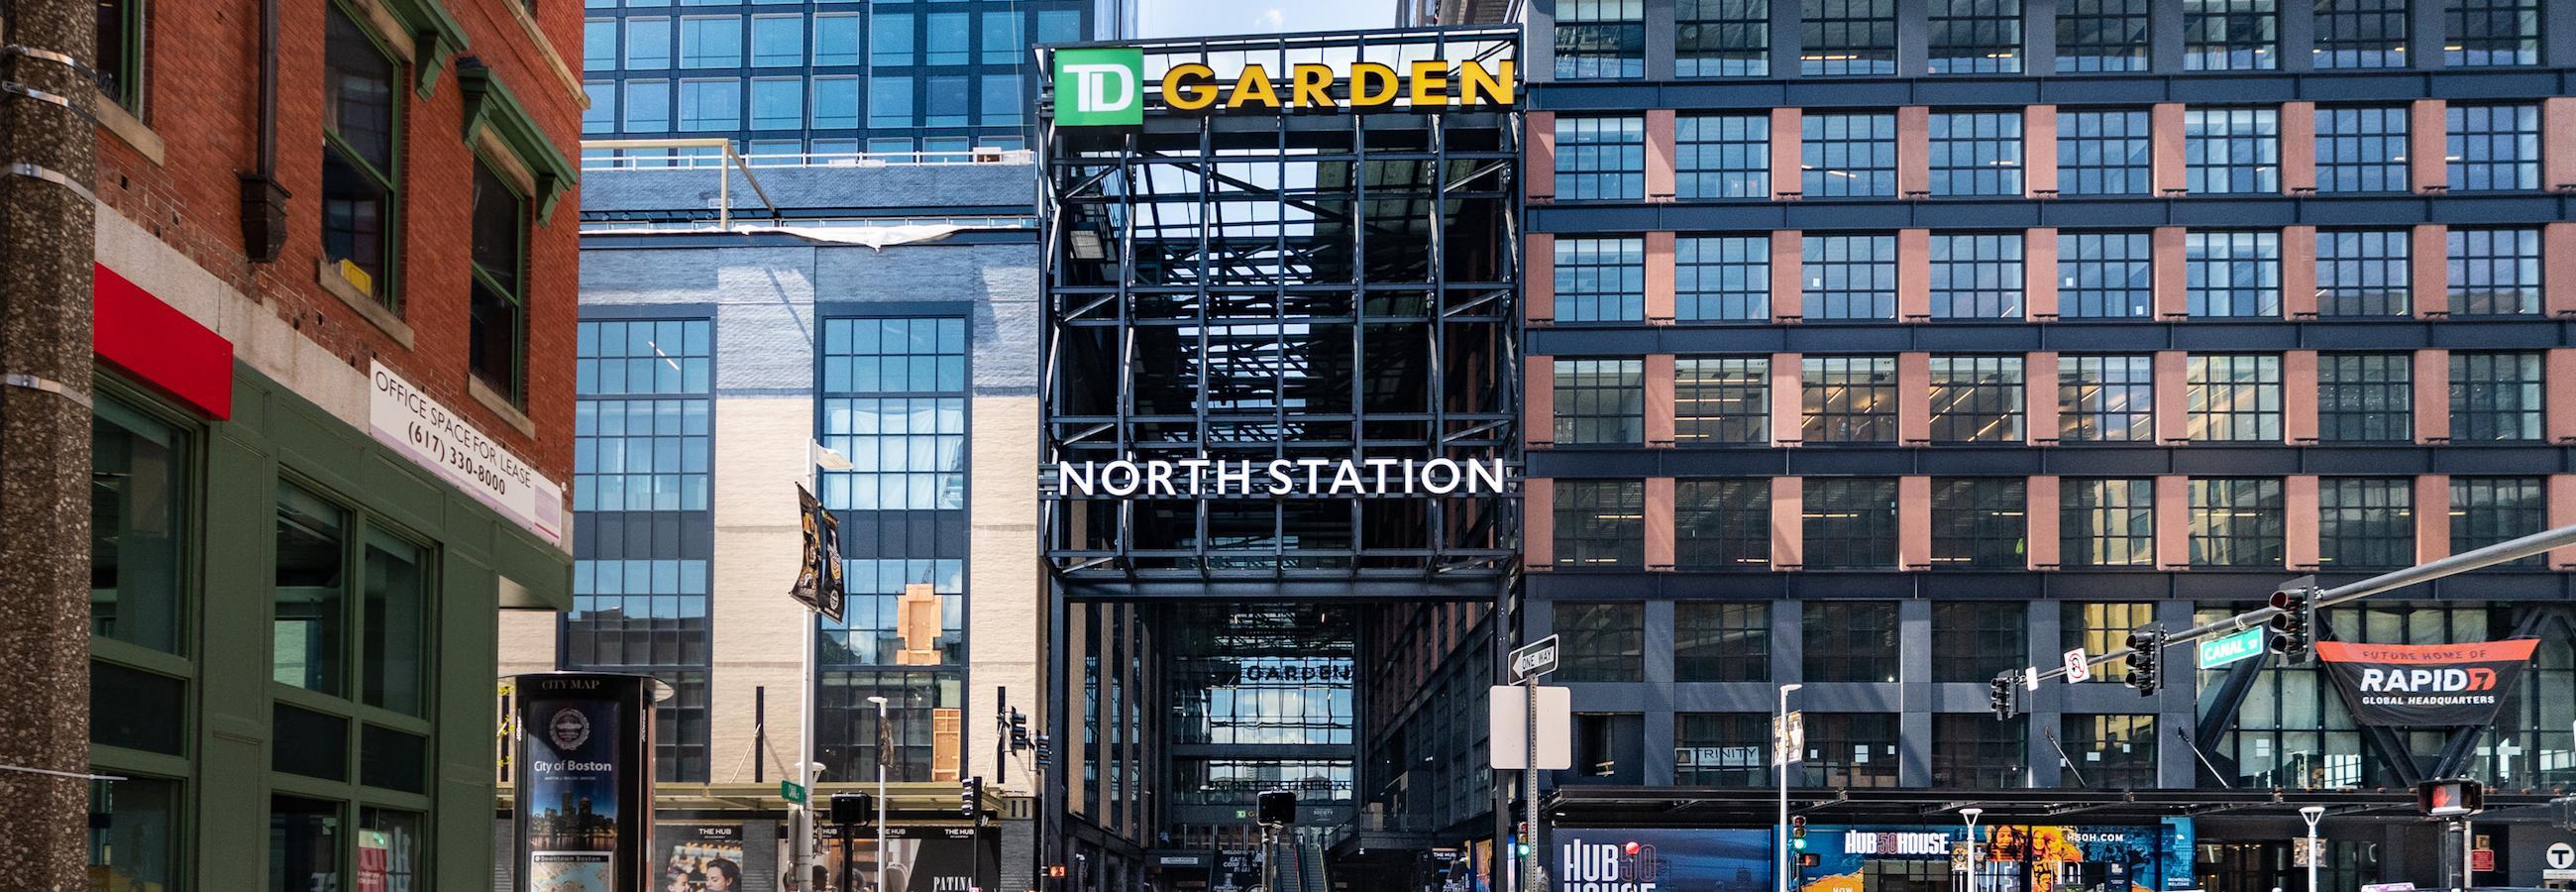 Causeway St entrance to TD Garden/North Station